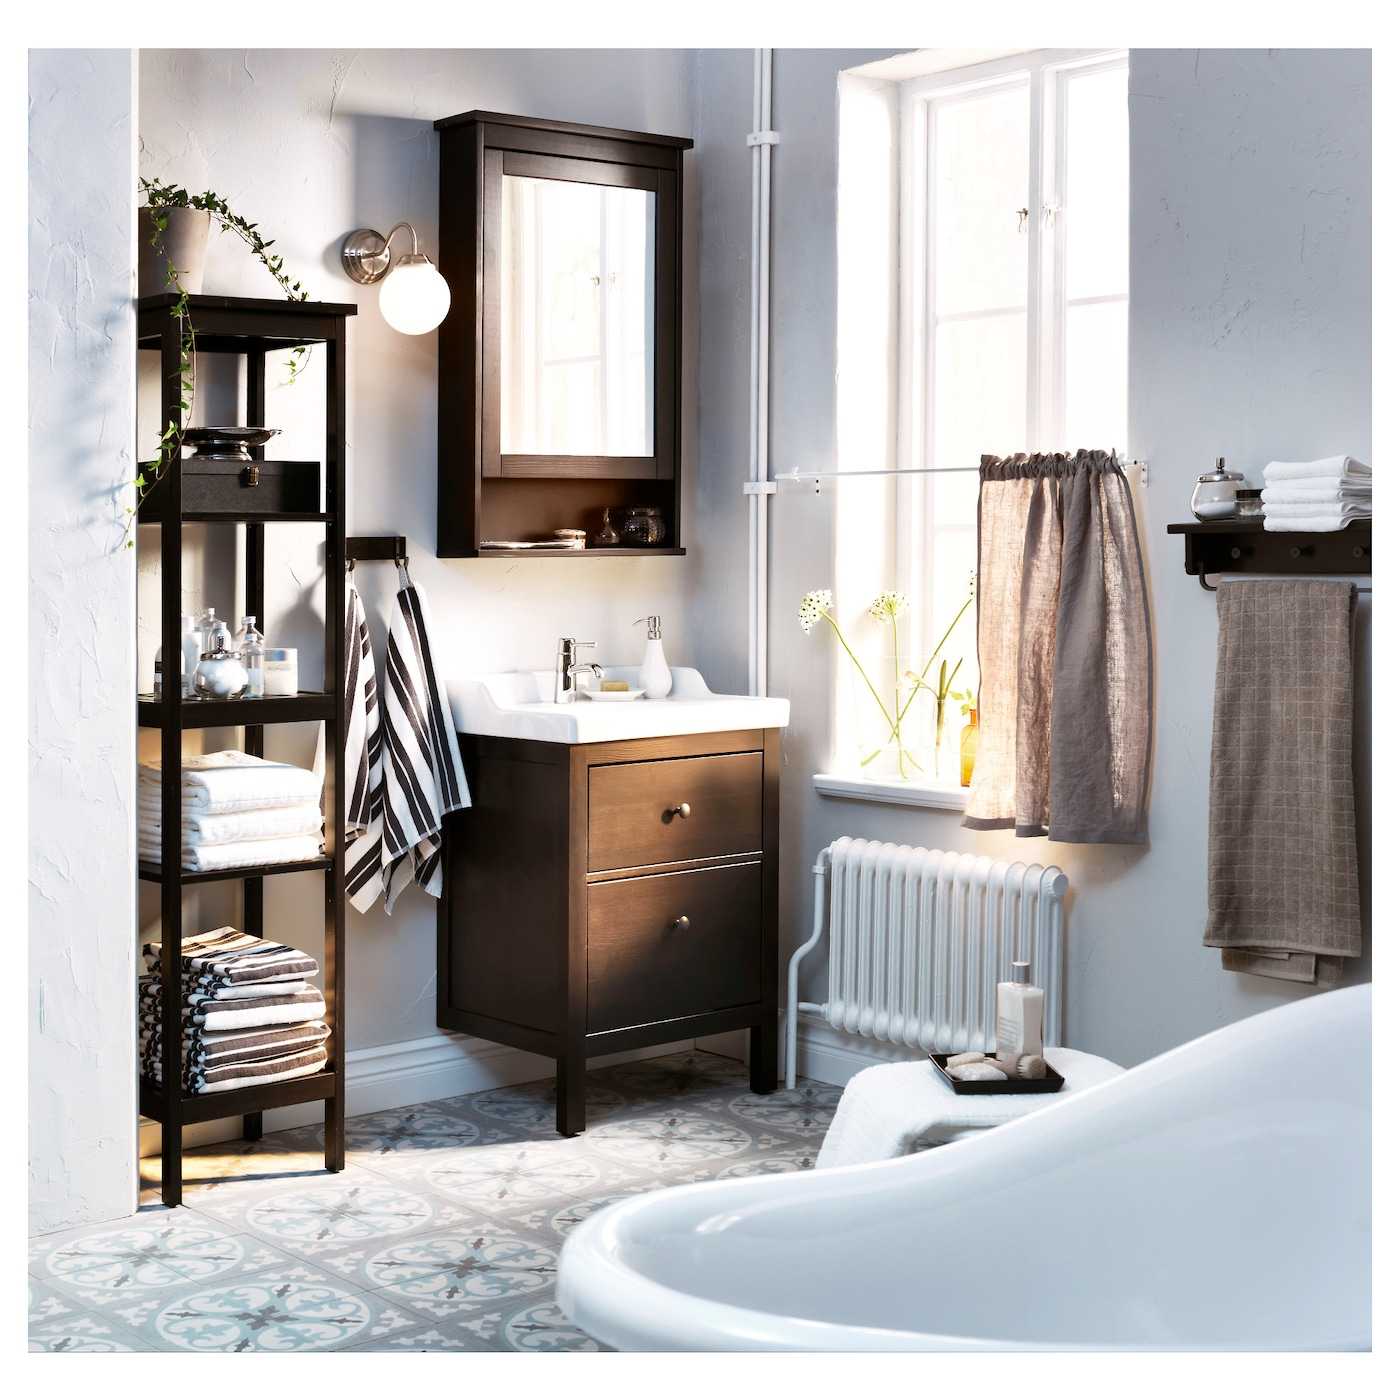 hemnes meuble miroir 1 porte teinture noir brun 63 x 16 x 98 cm ikea. Black Bedroom Furniture Sets. Home Design Ideas